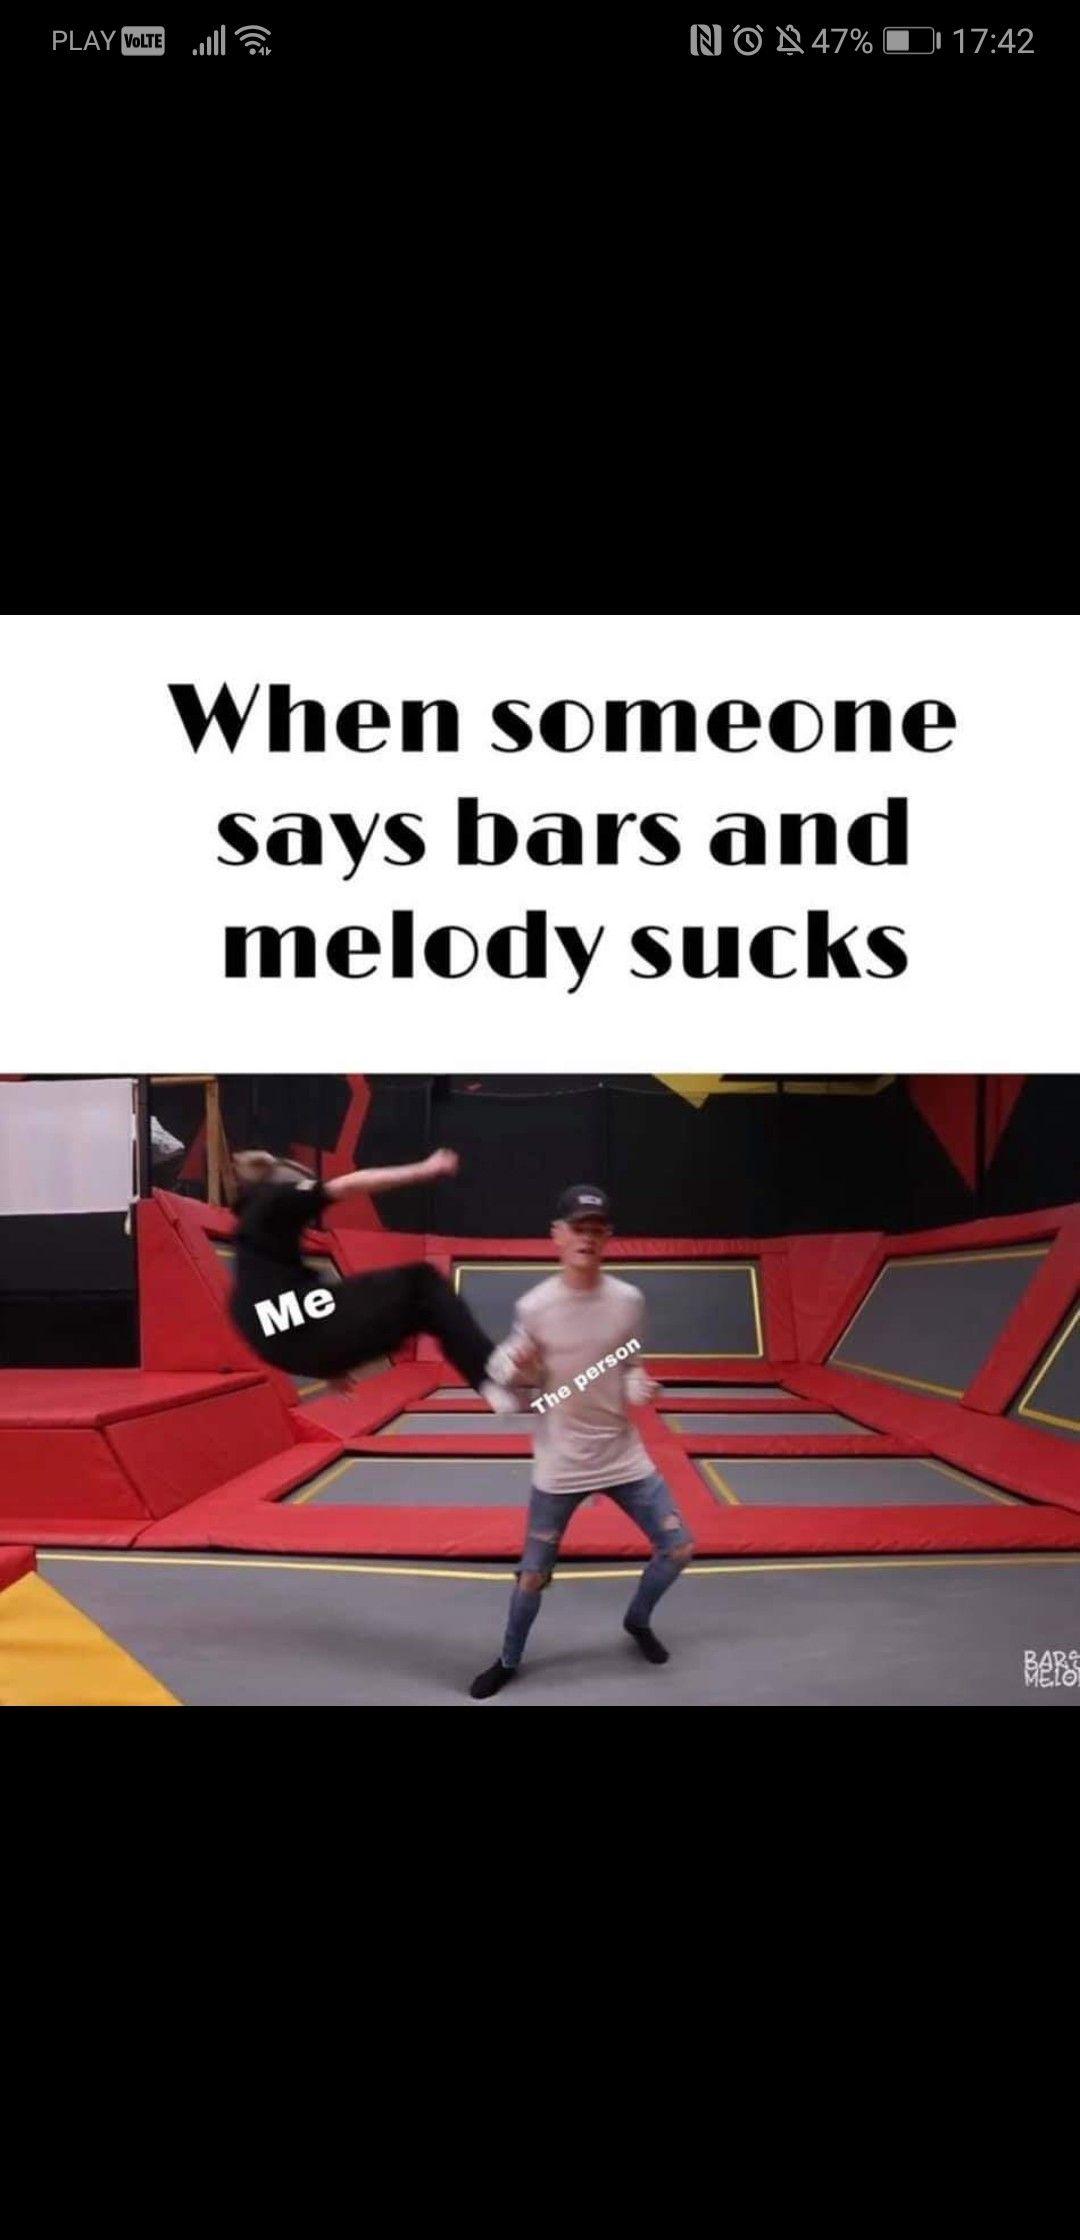 Pin By Majqbambino On Moja Milosc Bars And Melody When Someone Melody